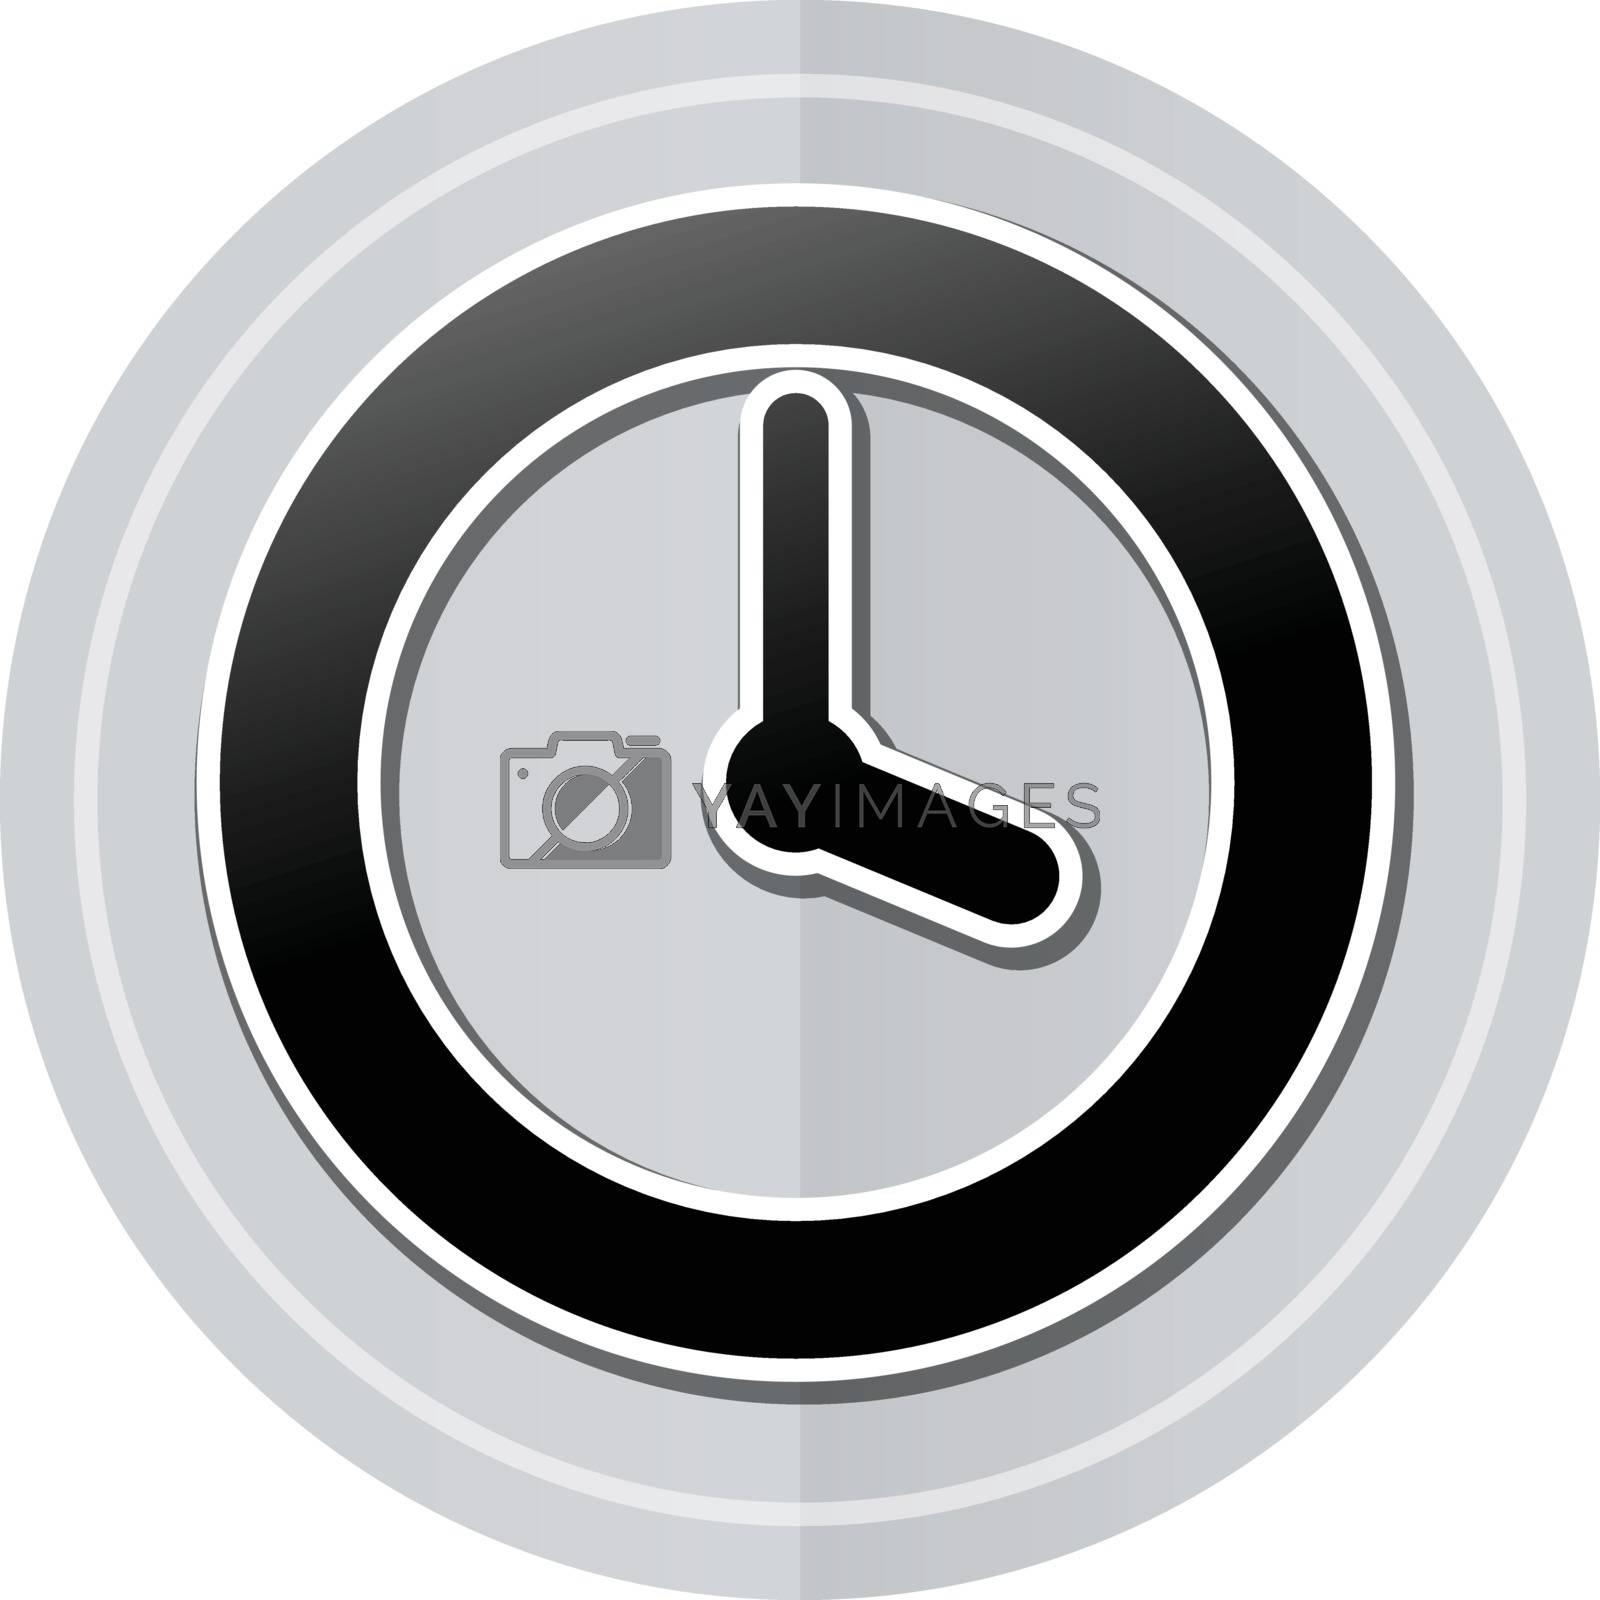 Illustration of time sticker icon simple design